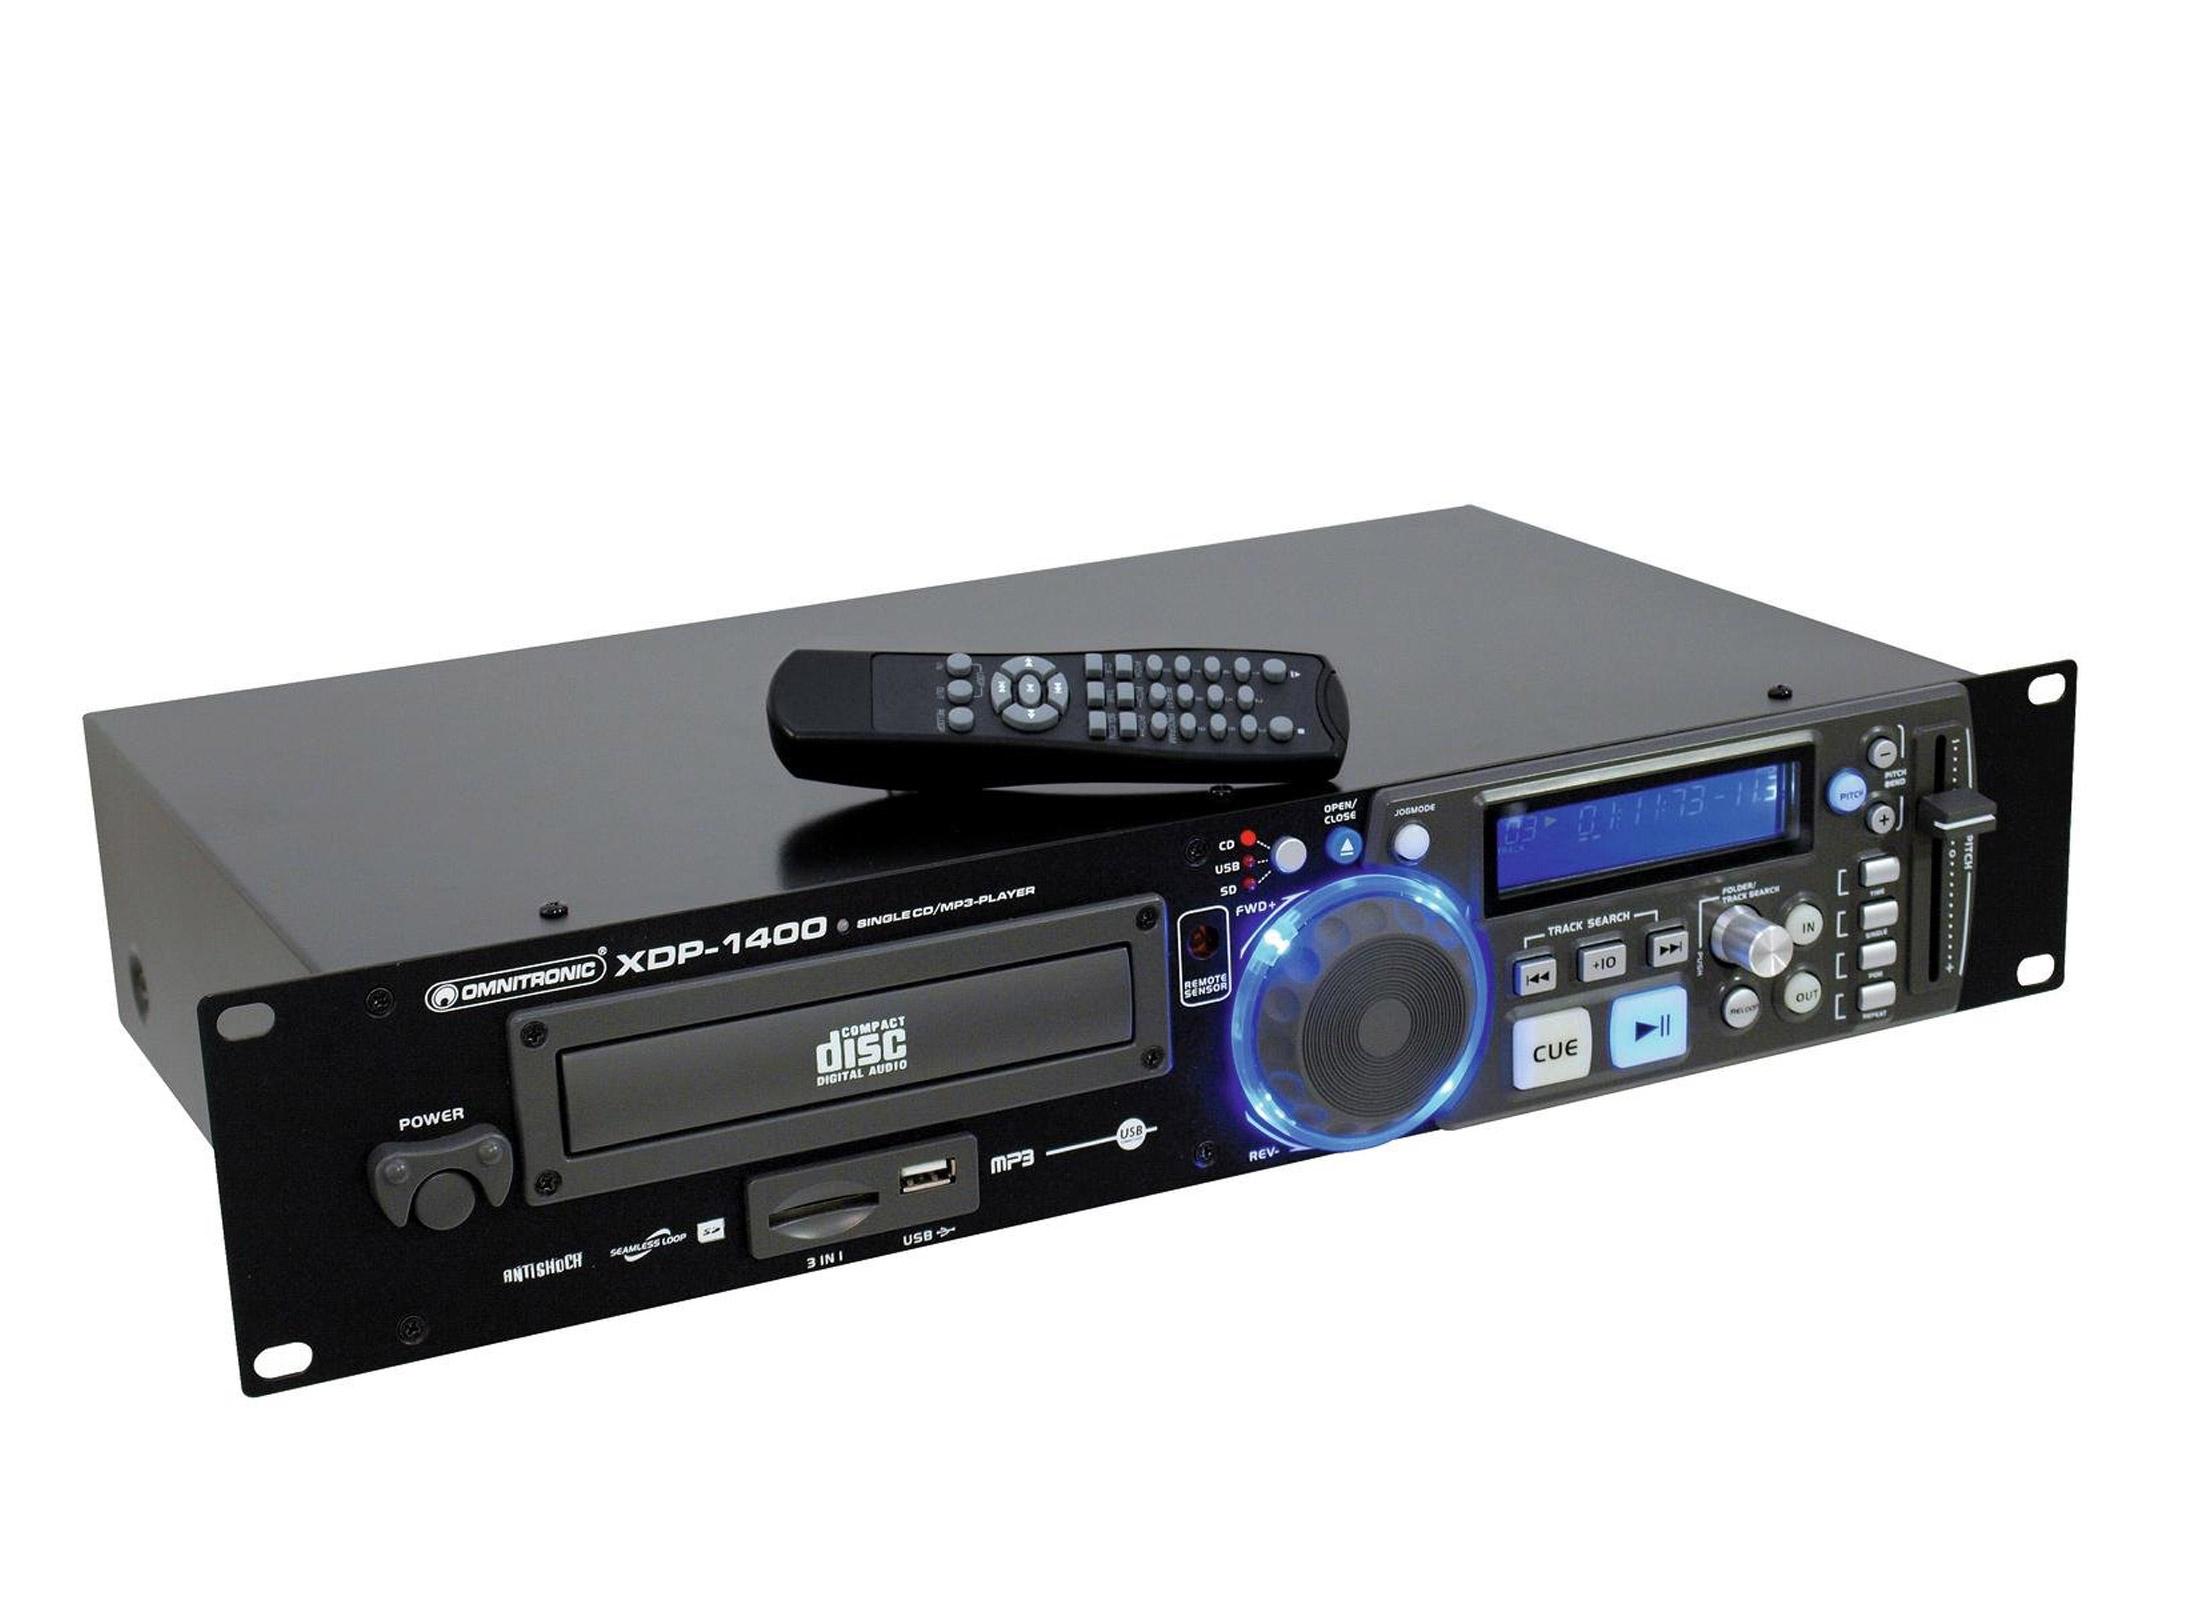 Omnitronic XDP-1400 CD / MP3 Player, 19